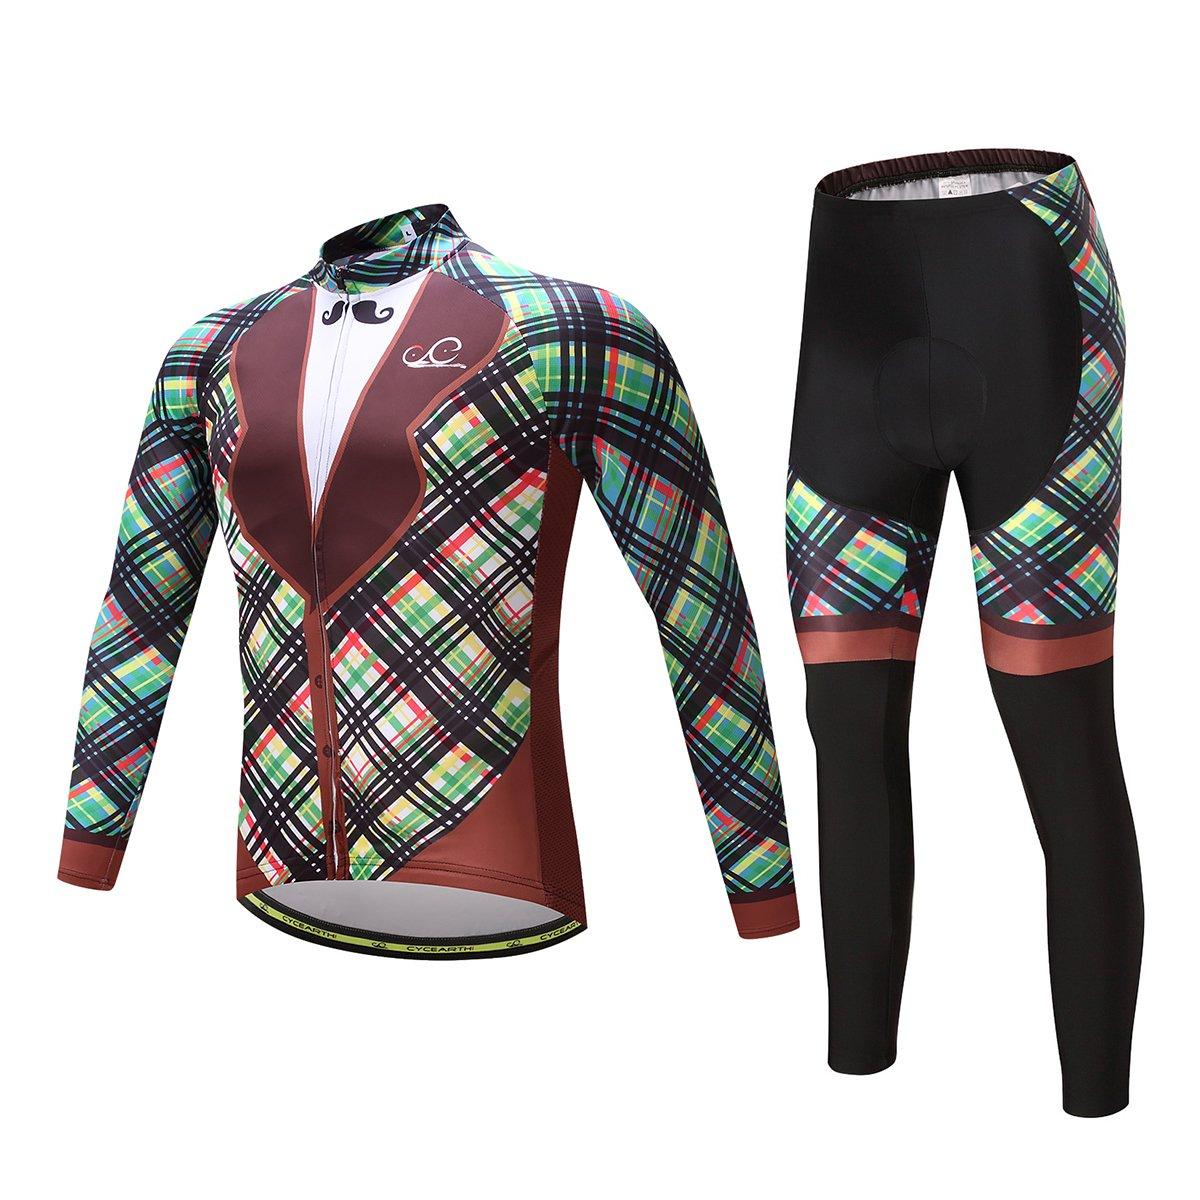 Cycearth Cycling Jersey Long Sleeve Set Men Winter Fleece Thermal Jackets Black Bib Pant (Ce603a, XL) by Cycearth